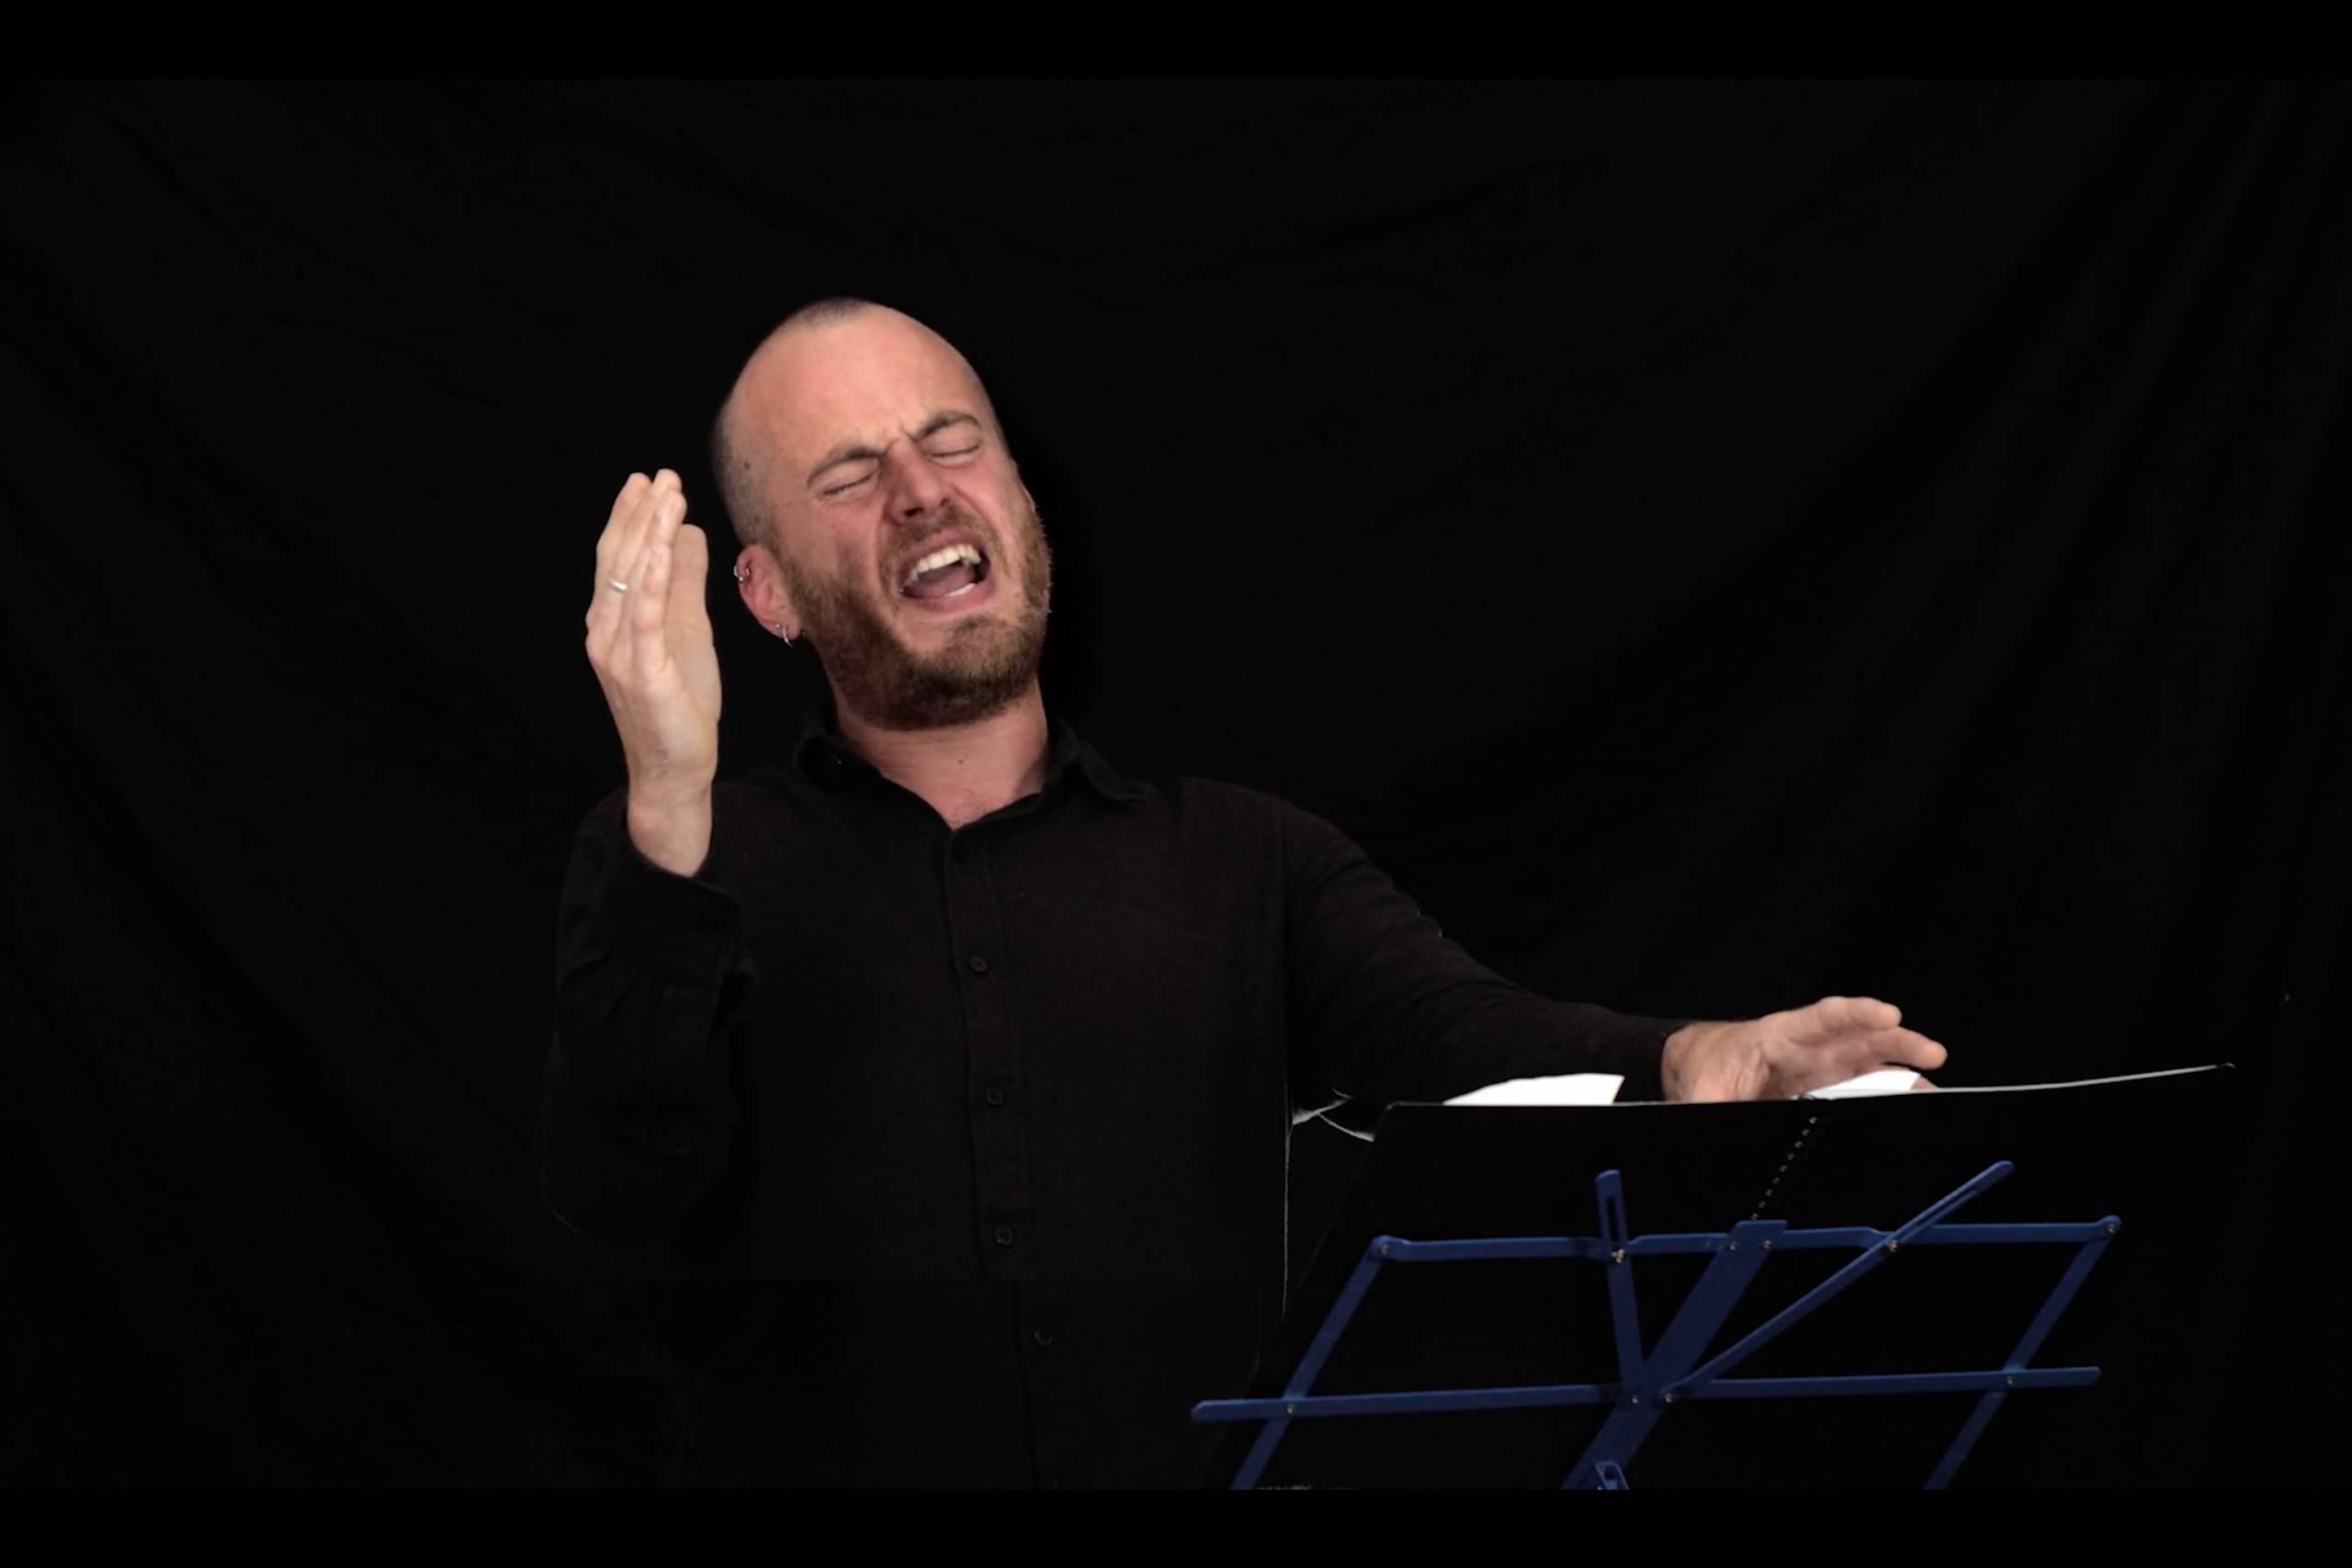 man performing spoken word